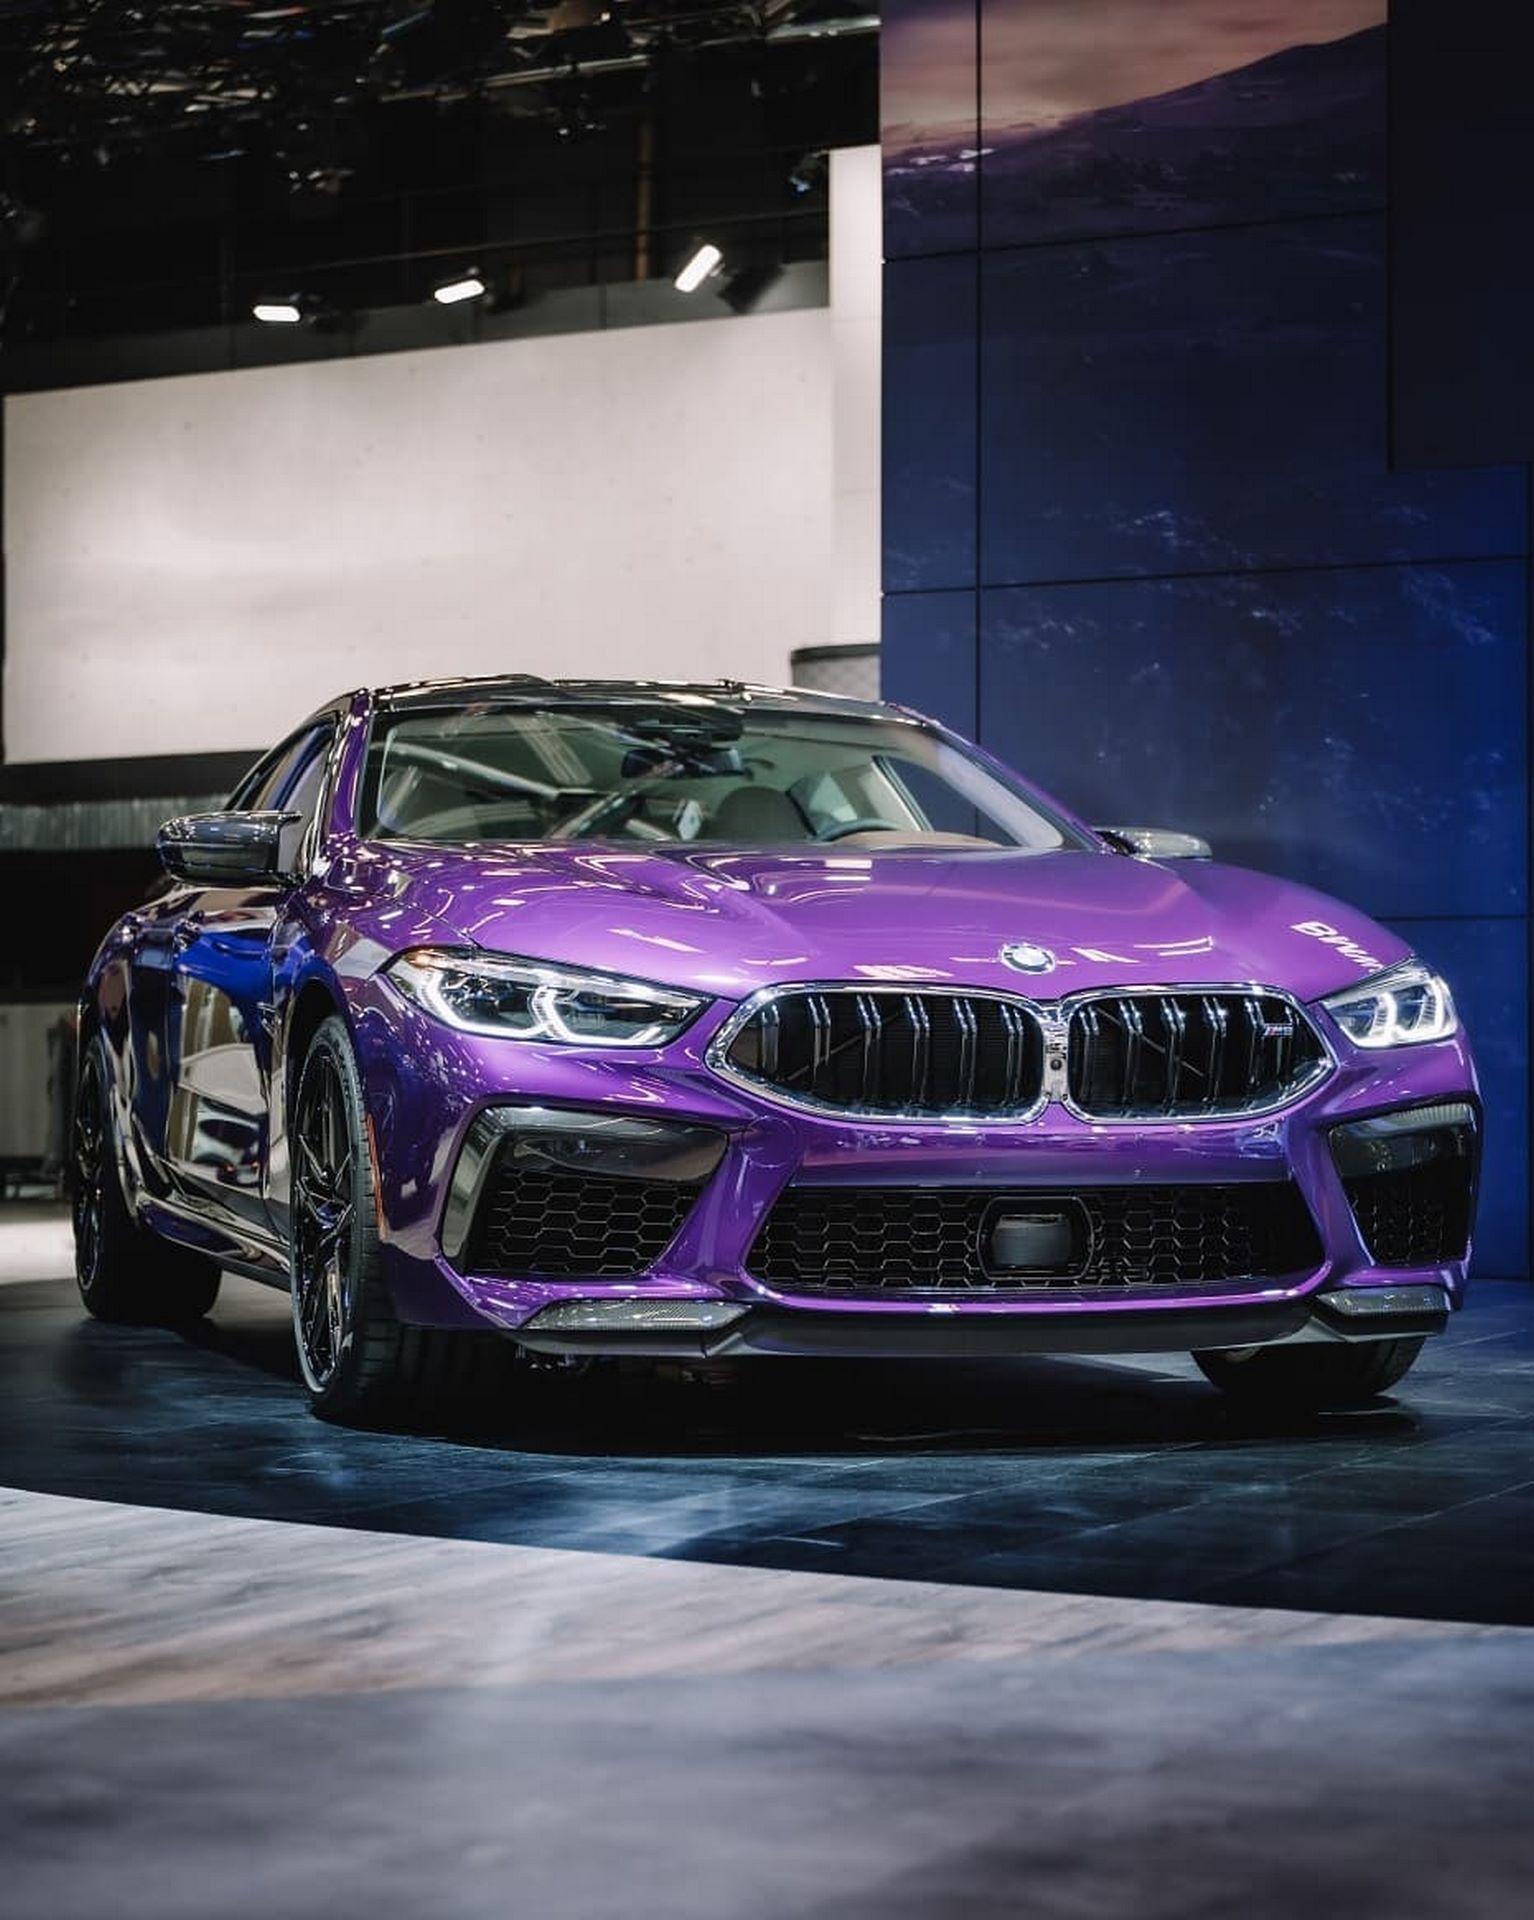 BMW-M8-Gran-Coupe-Twilight-Purple-5